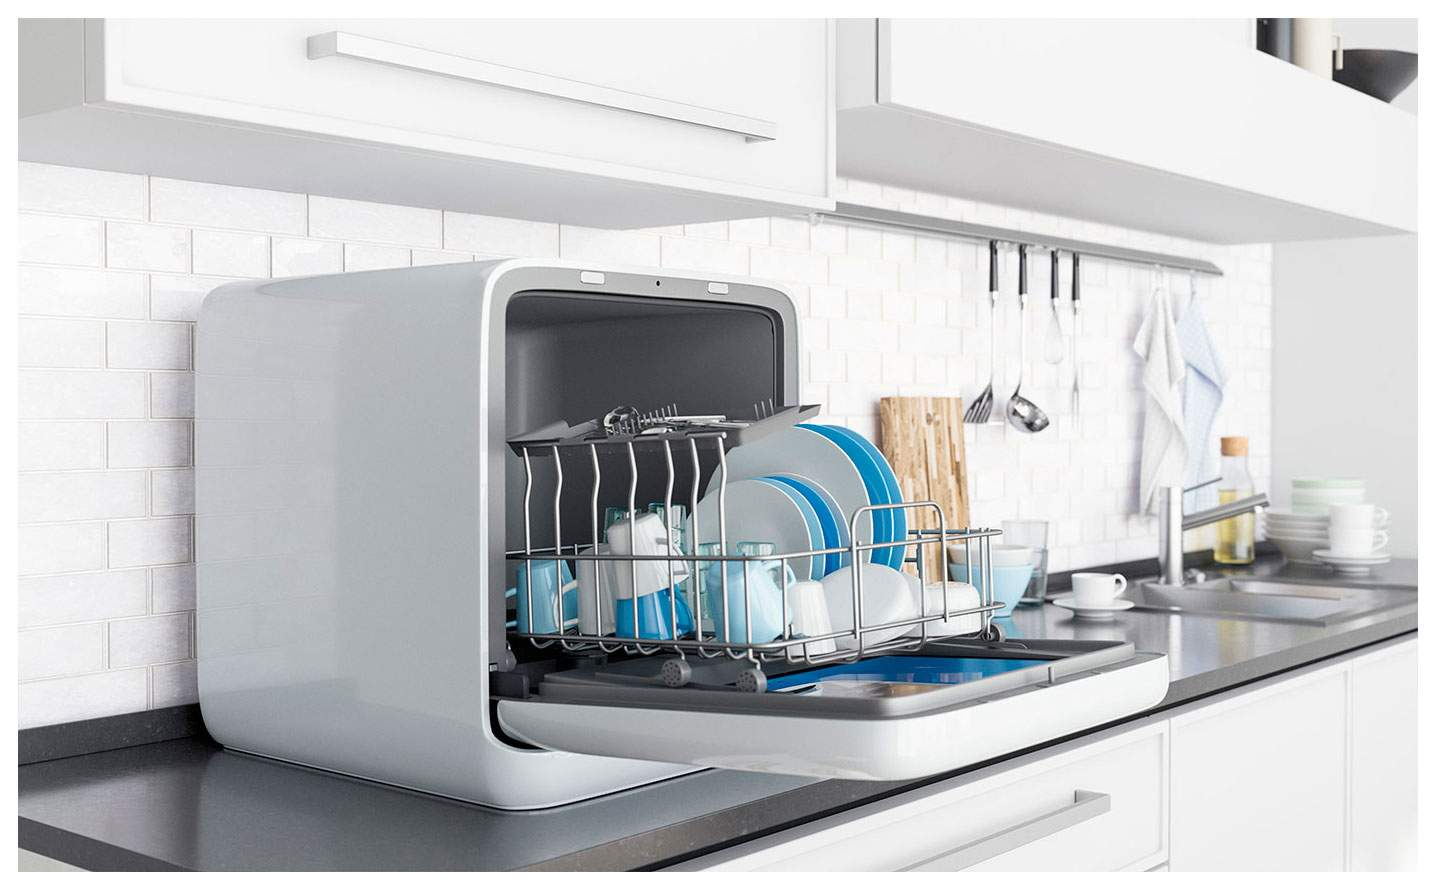 Мидея Midea мини посудомойка